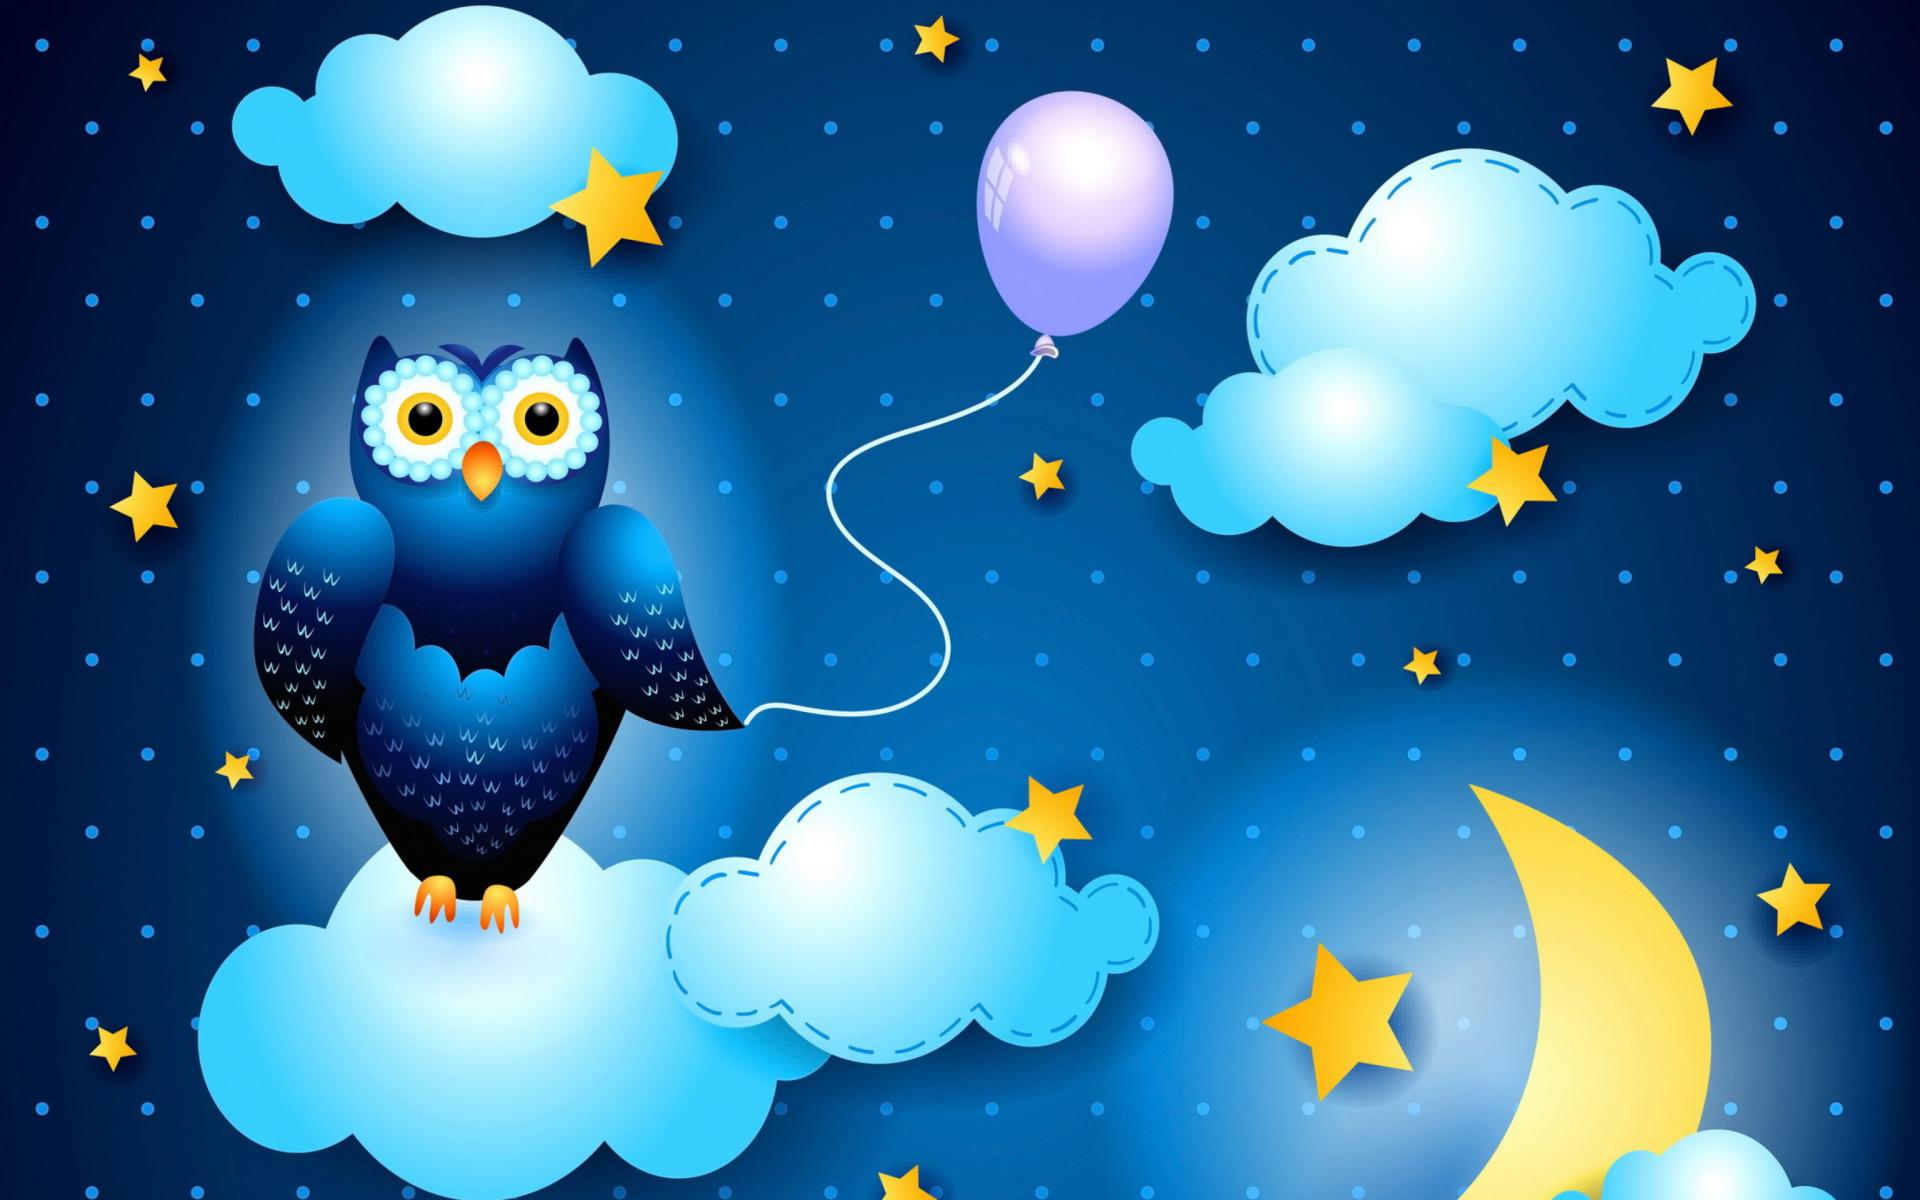 Night Owl Wallpaper For Widescreen Desktop PC 1920x1080